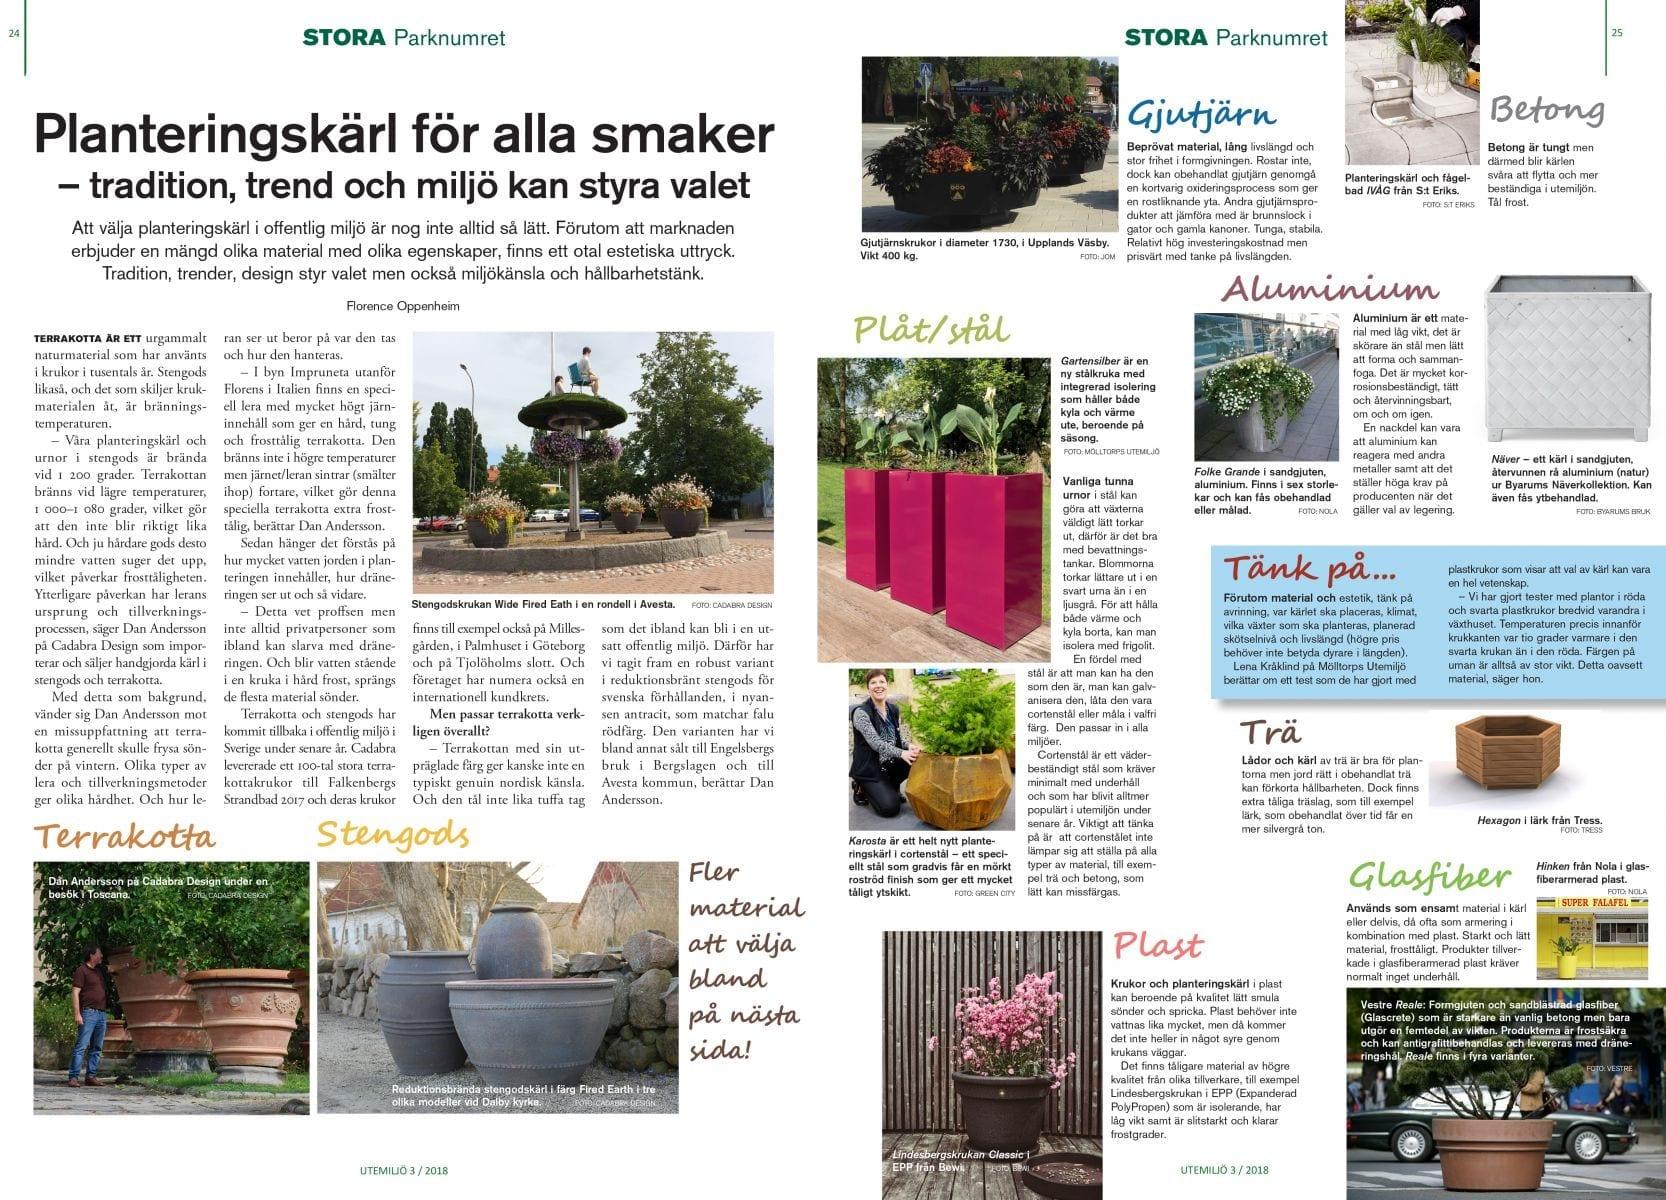 stora planteringskärl utemiljö nr 3 2018